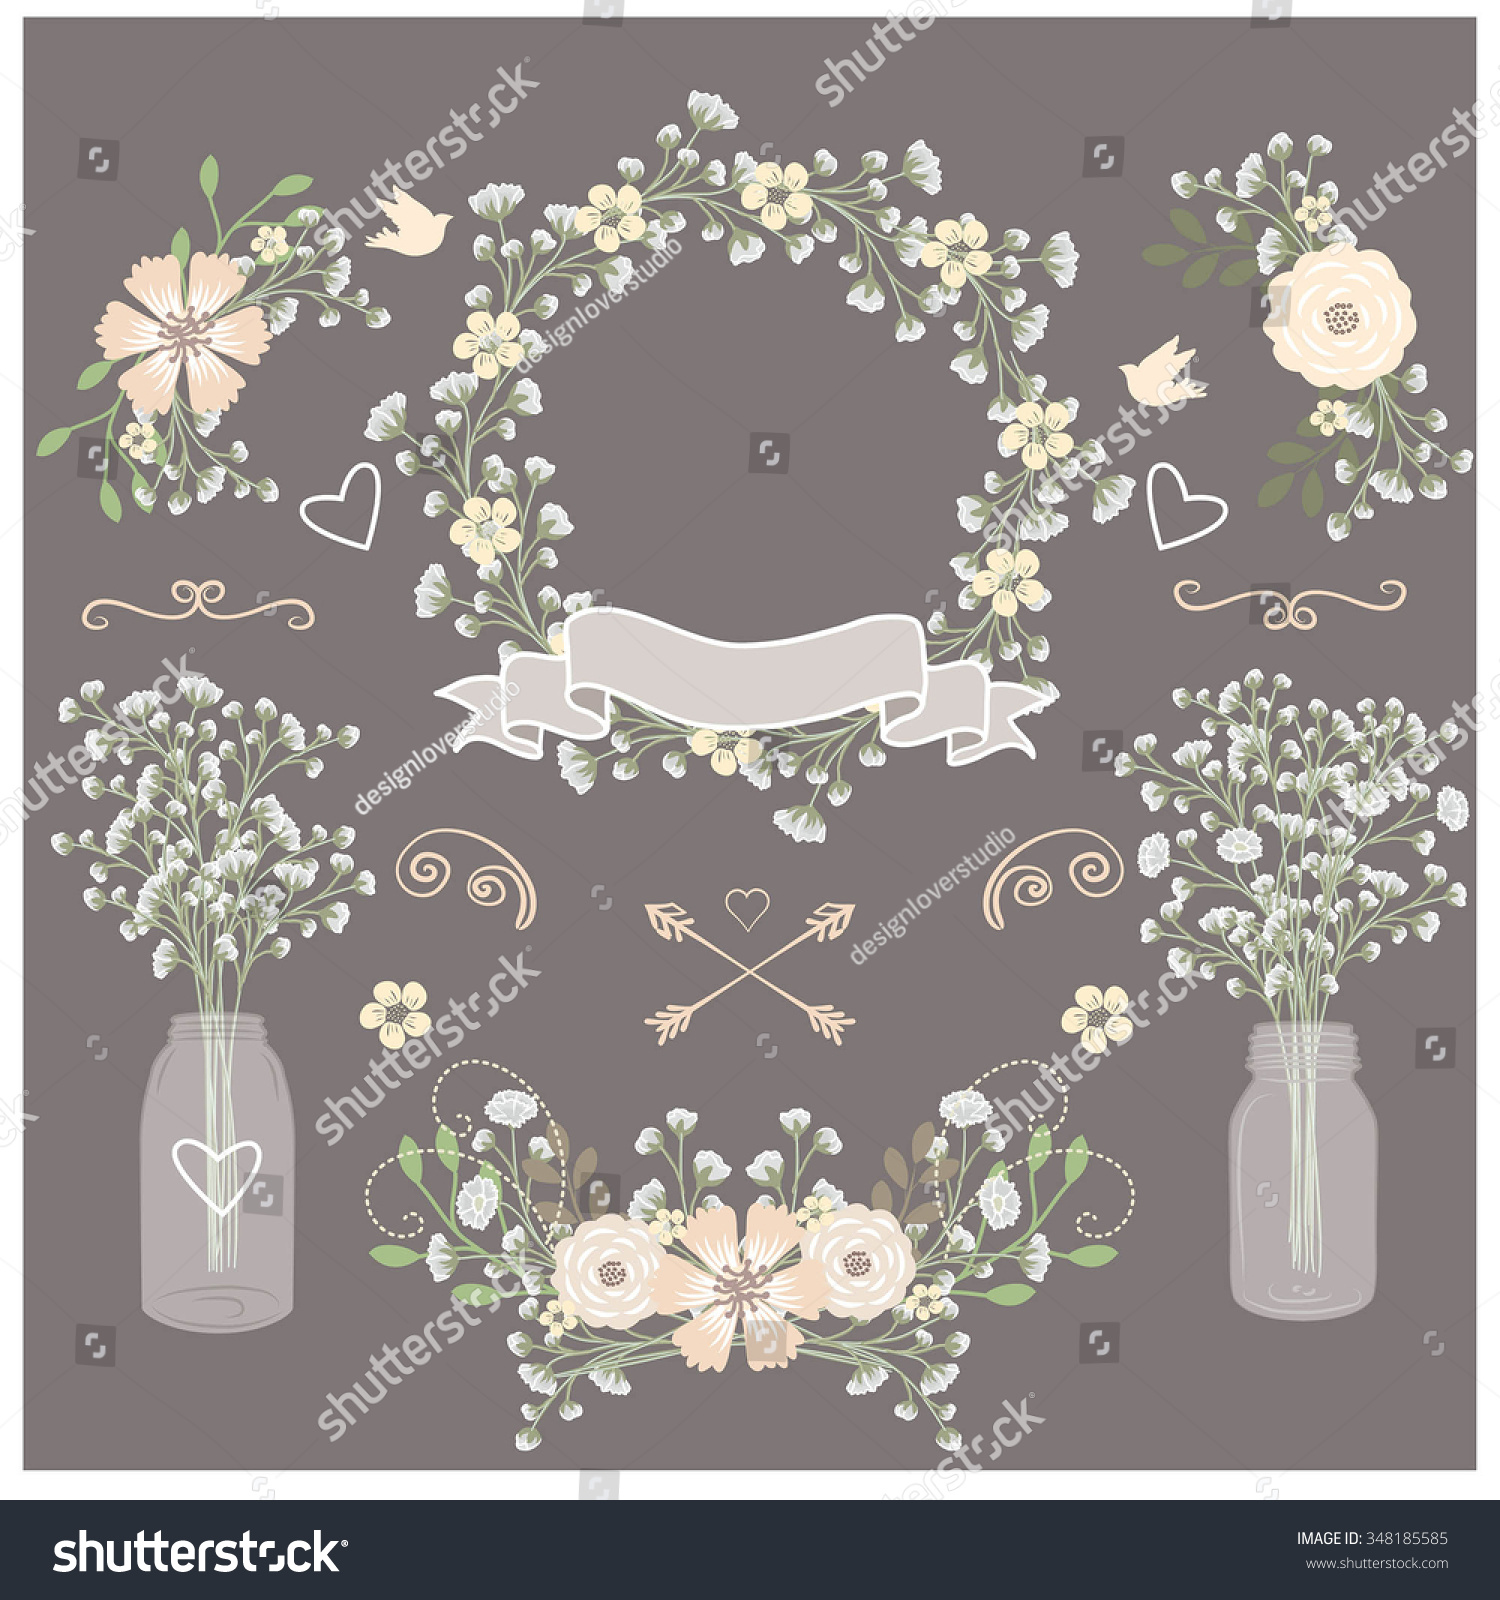 2 mason jar wedding invitations Mason Jar Wedding Invitation Rustic Wedding Invitation Printable Spring Wedding Invitation